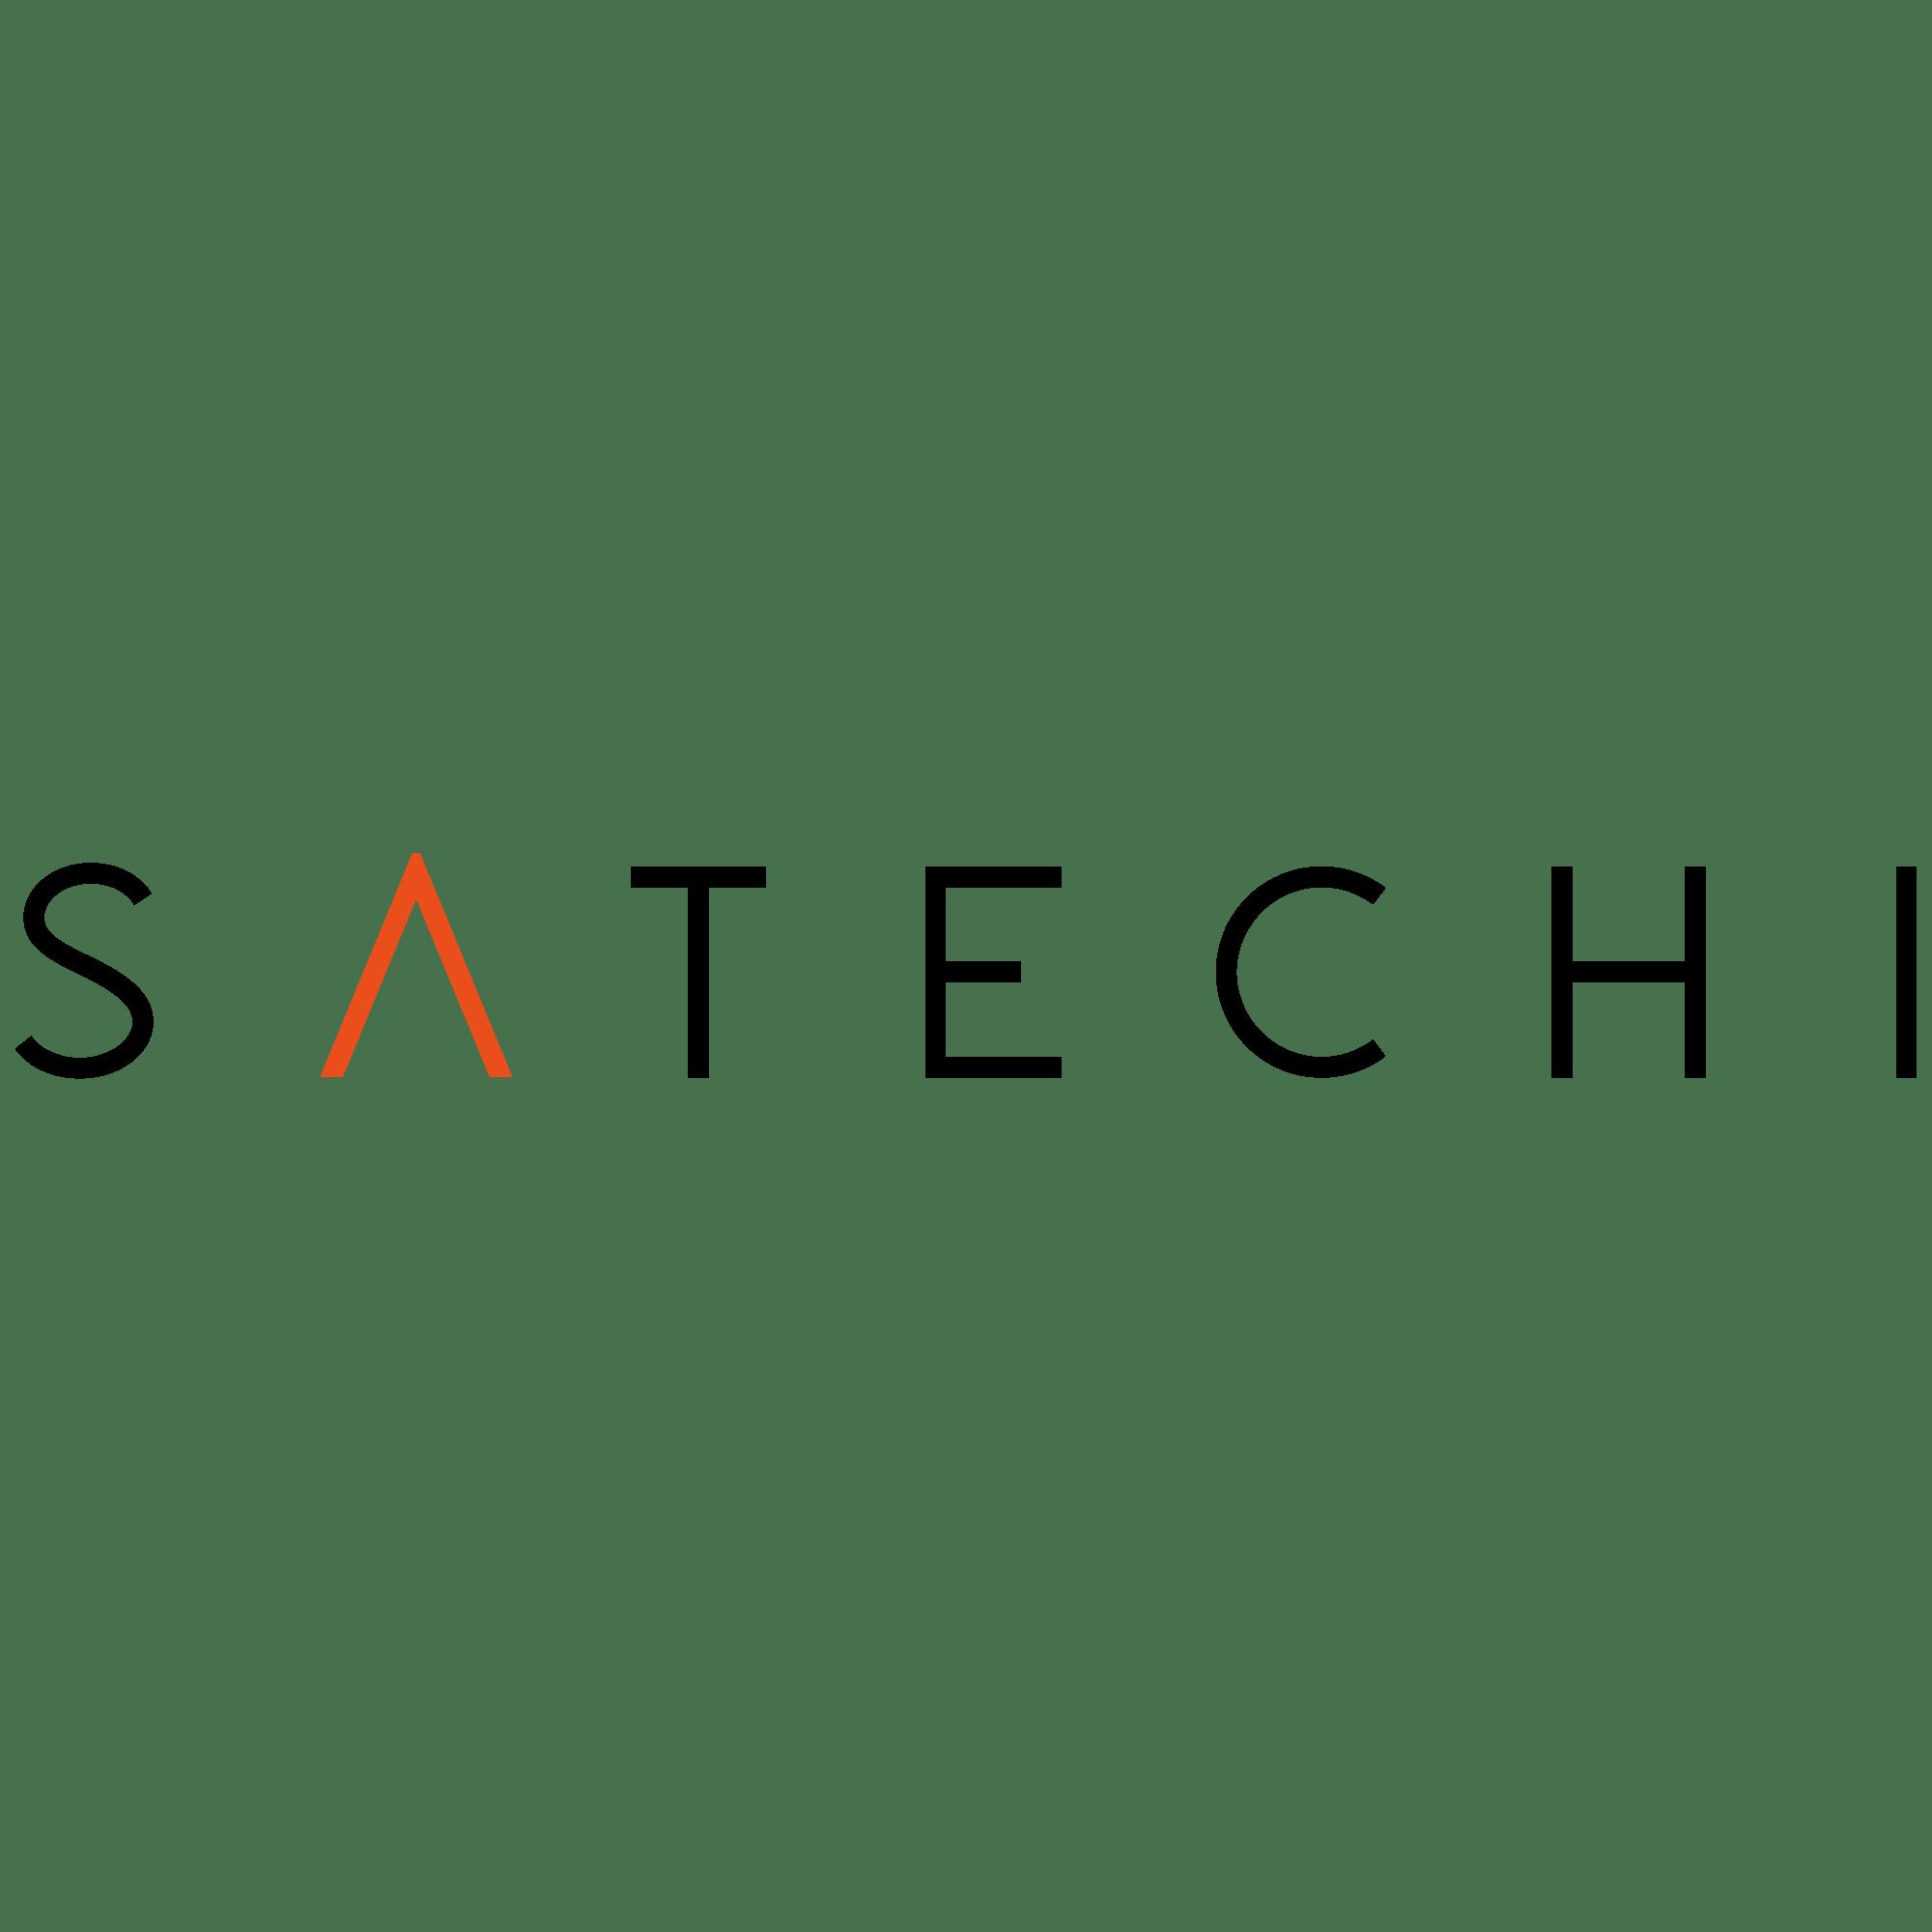 Satechi